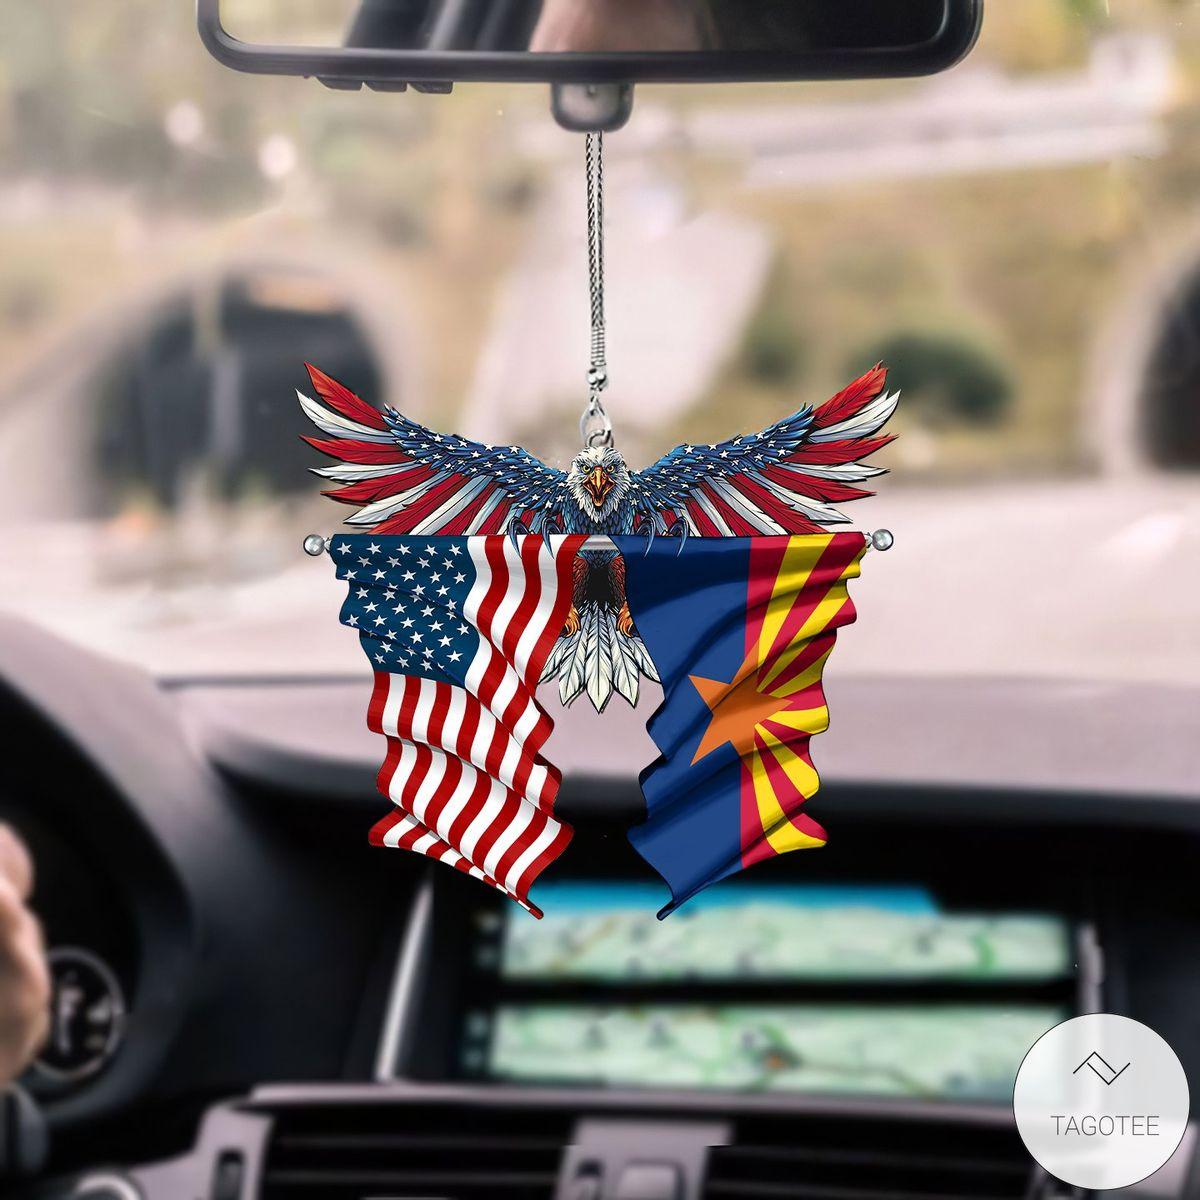 Arizona State Flag and United States Marine Corps Flag Car Hanging Ornament